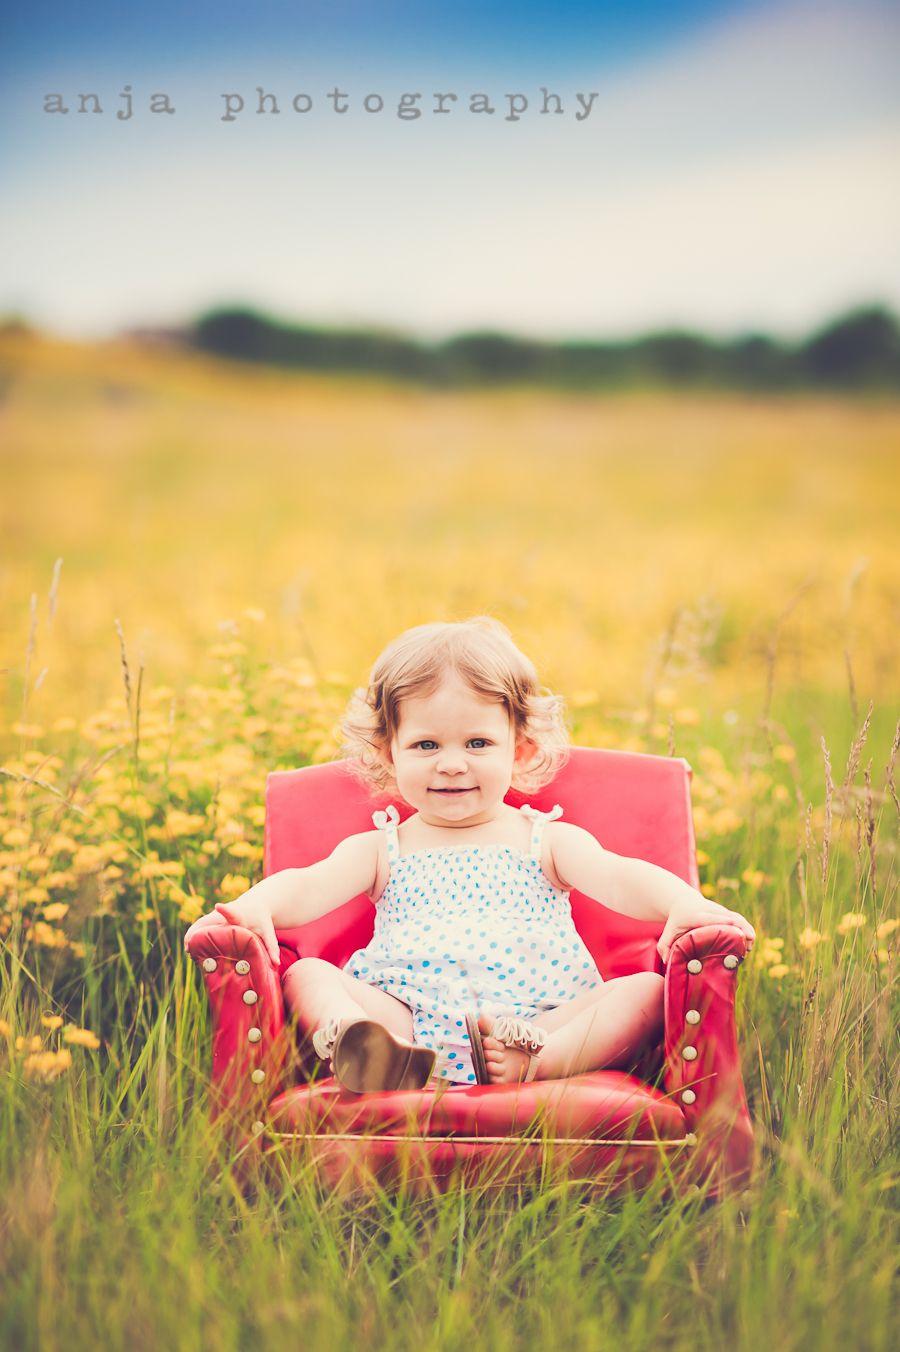 love the field & love the chair. anja photography (winner of NAPCP new photog)